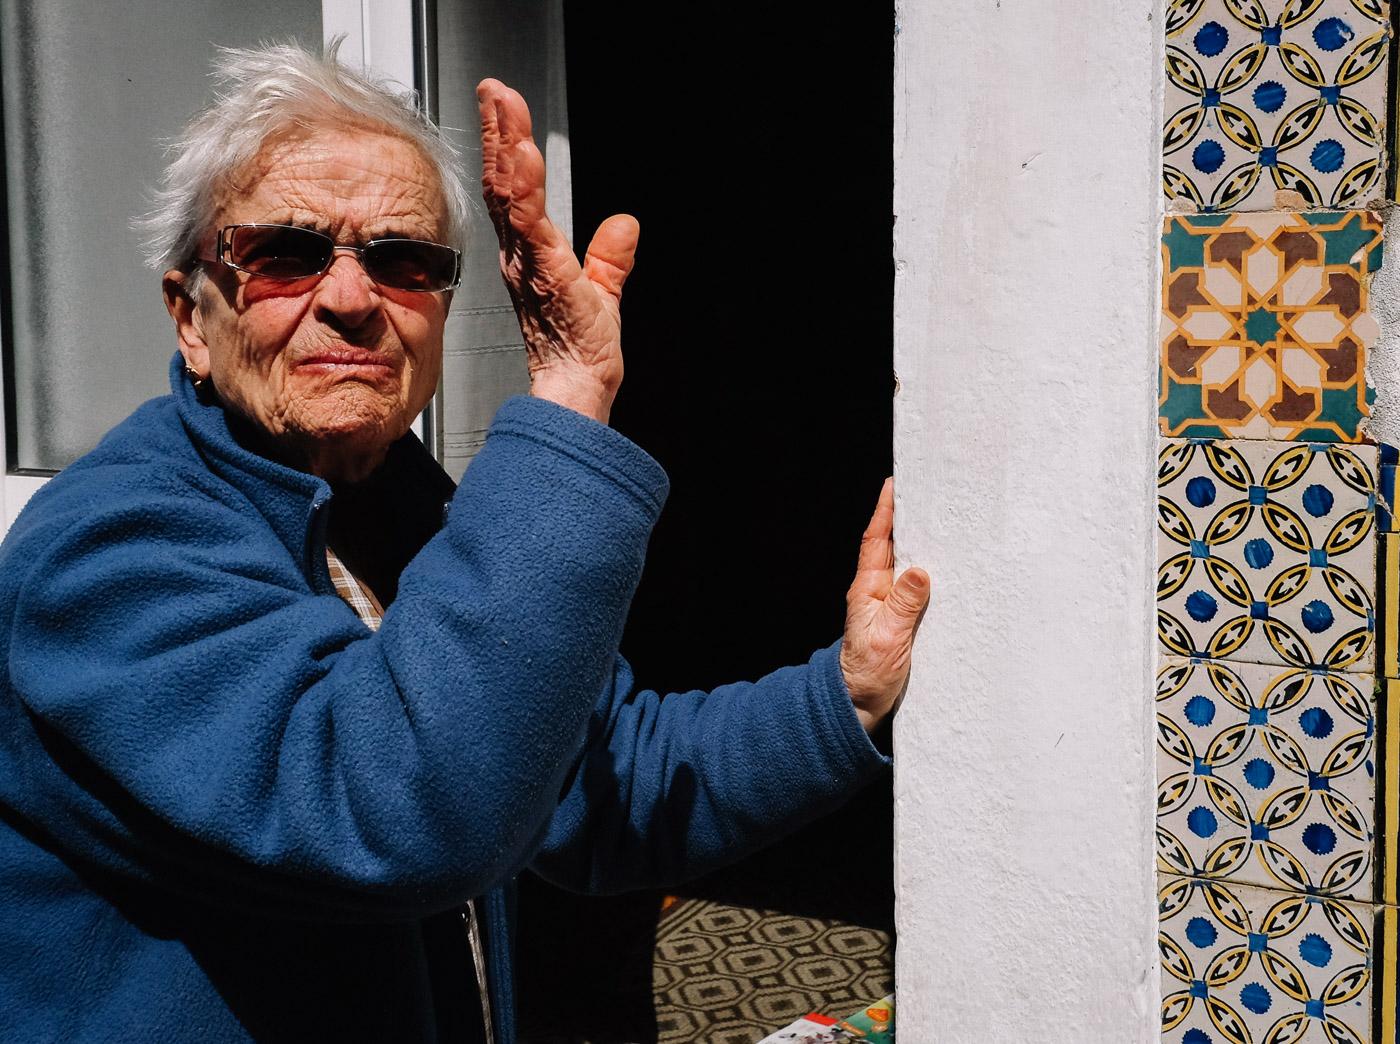 hb images - Aveiro - woman waving - 1_